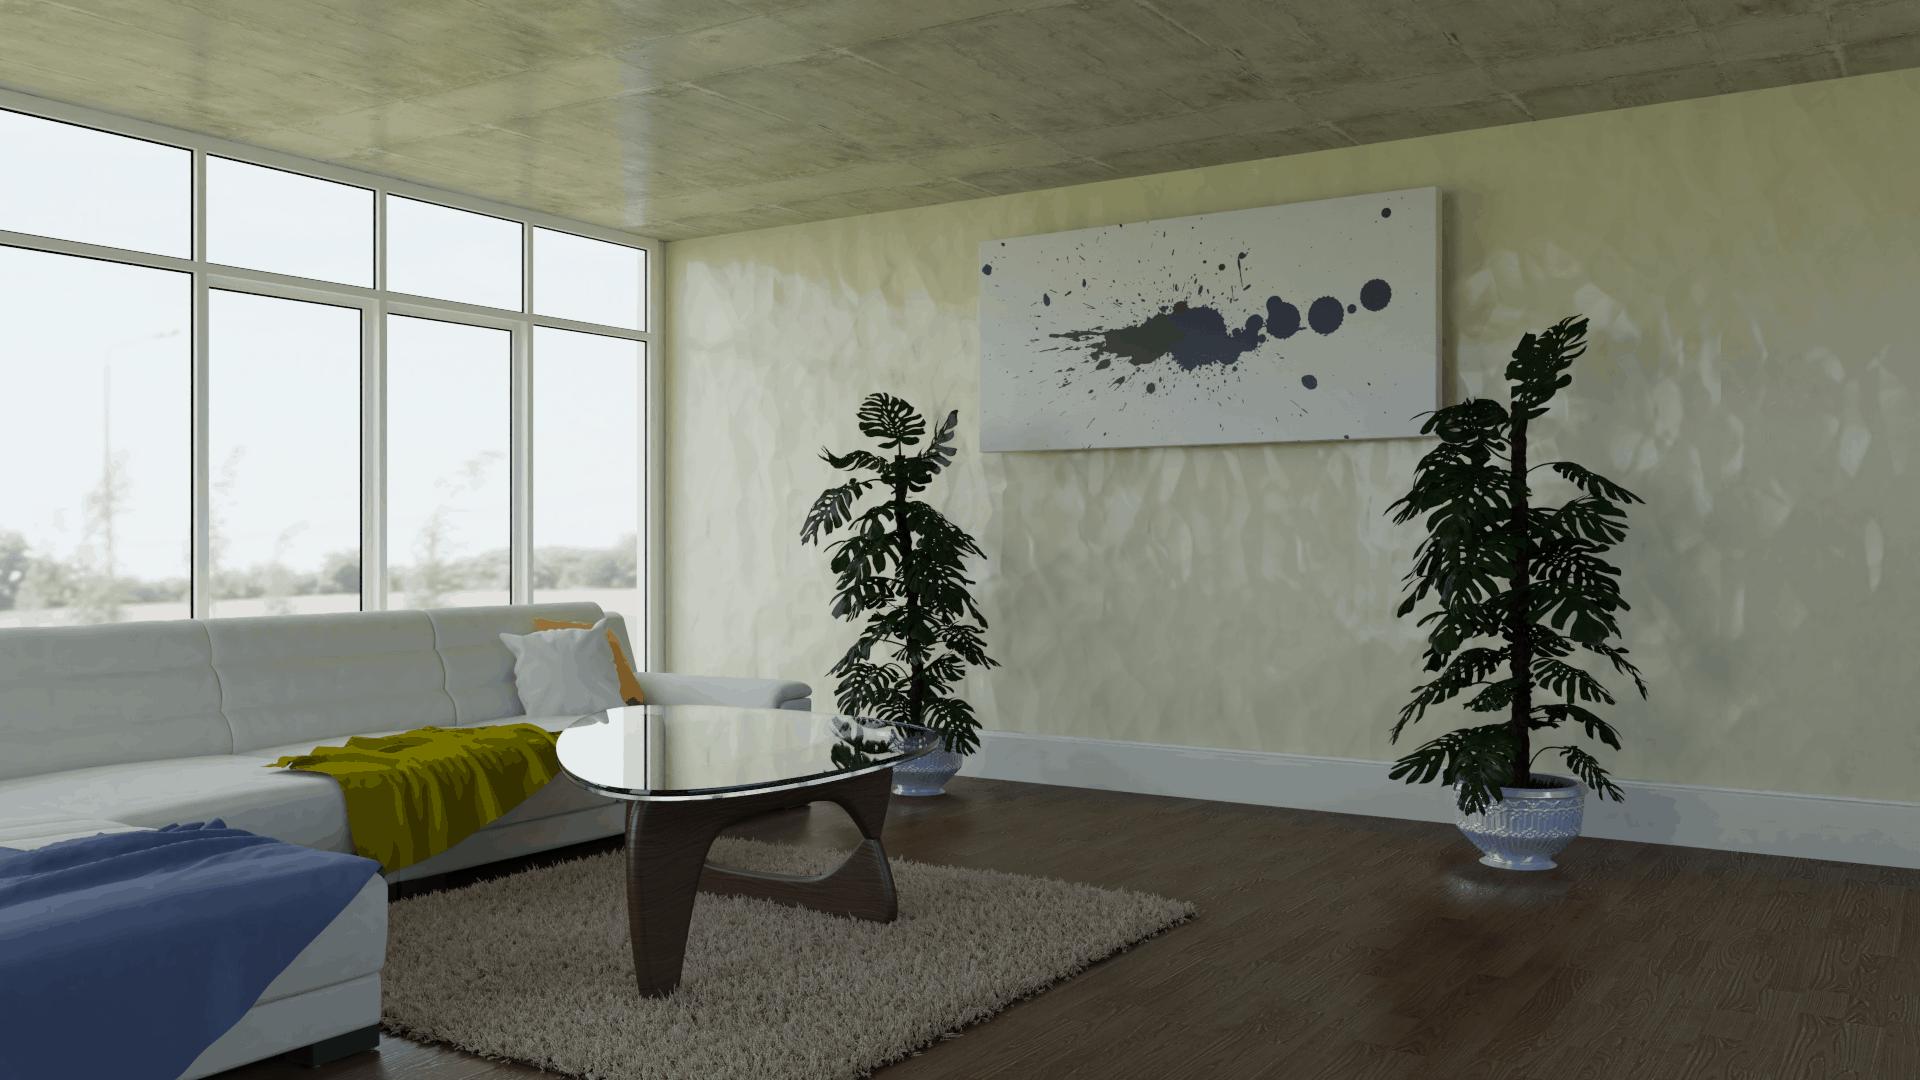 Metall Wandverkleidung Interior